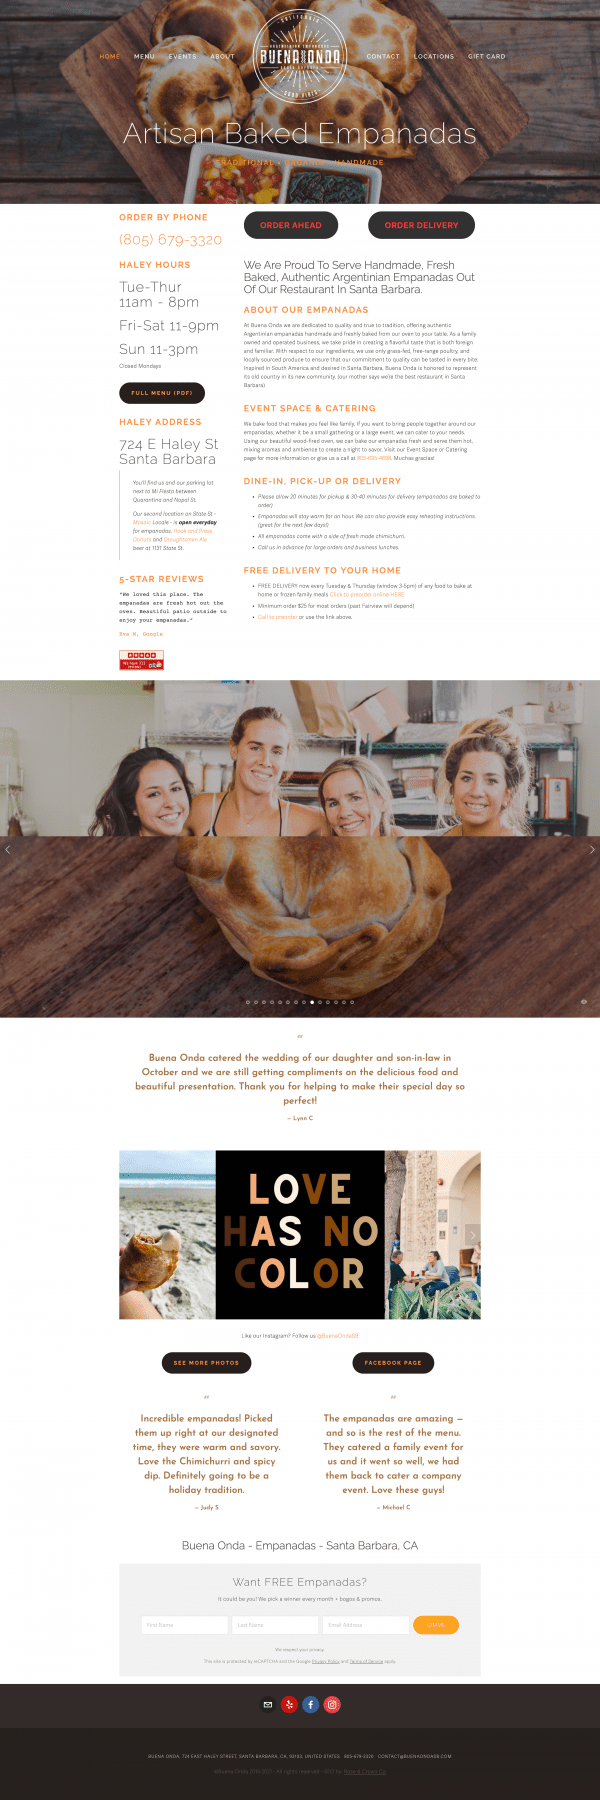 Visual Representation of the website refresh we did on Buena Onda Empanadas website.